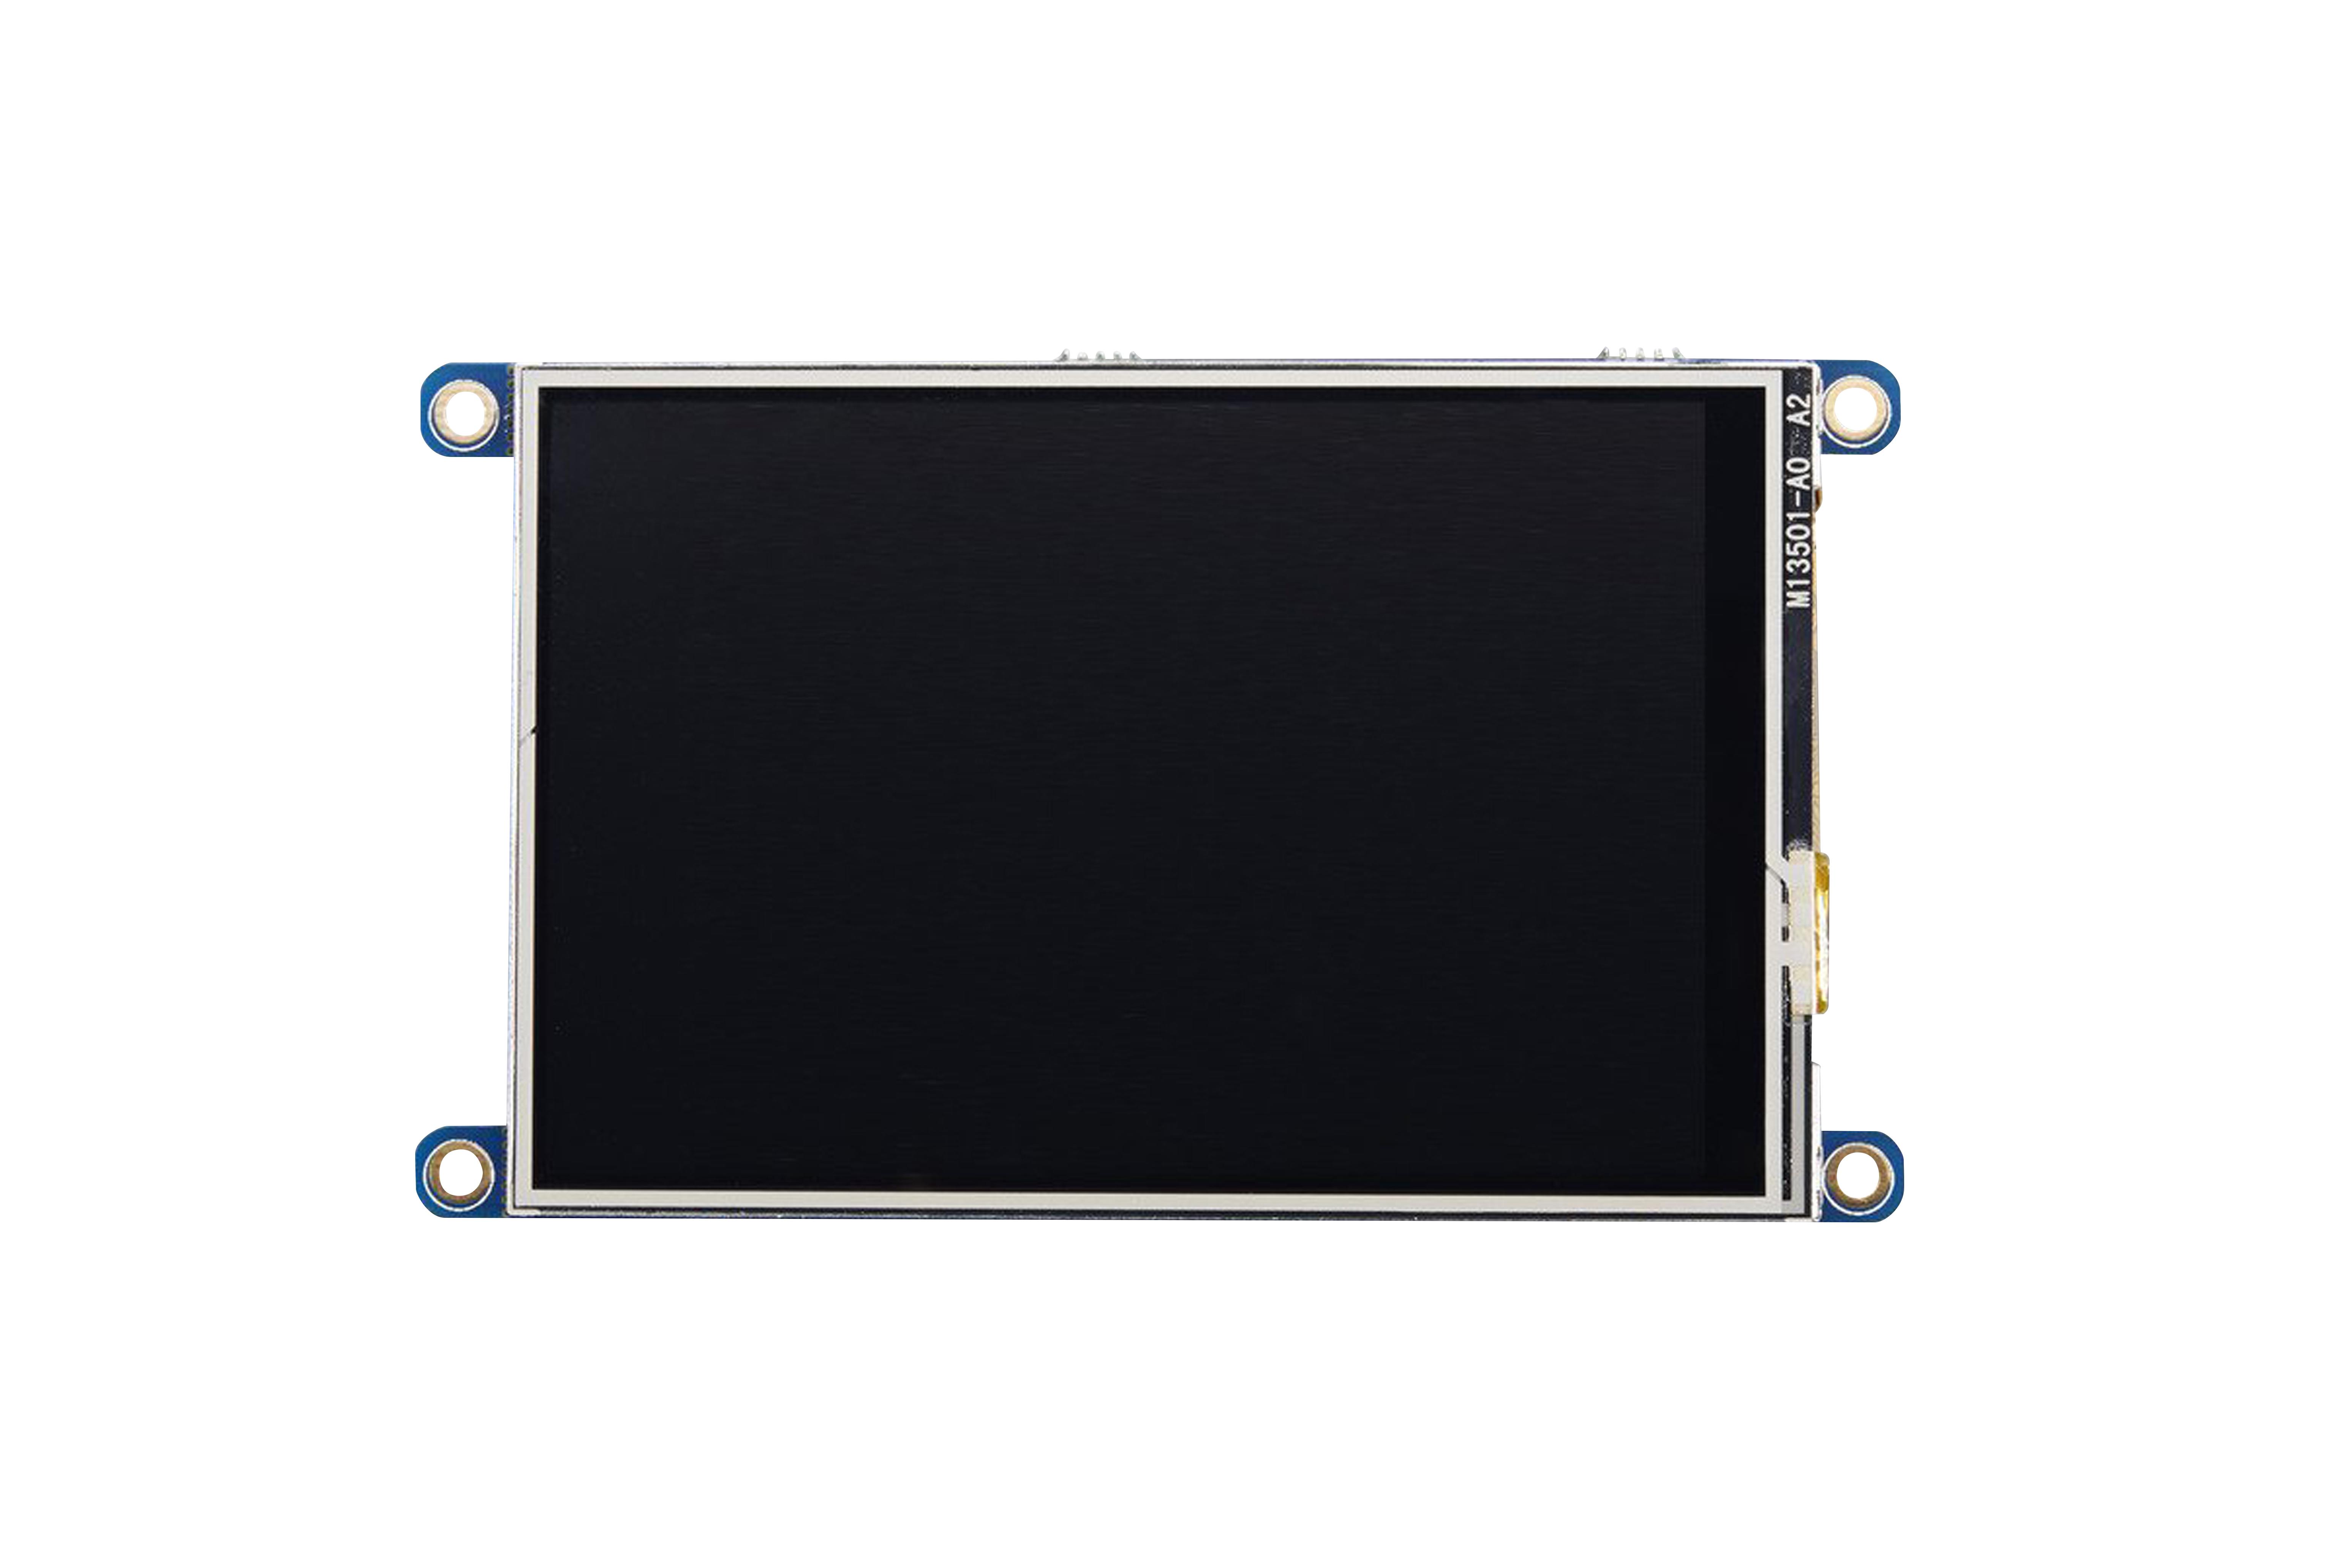 Écran tactile PiTFT Plus 3.5 Raspberry Pi